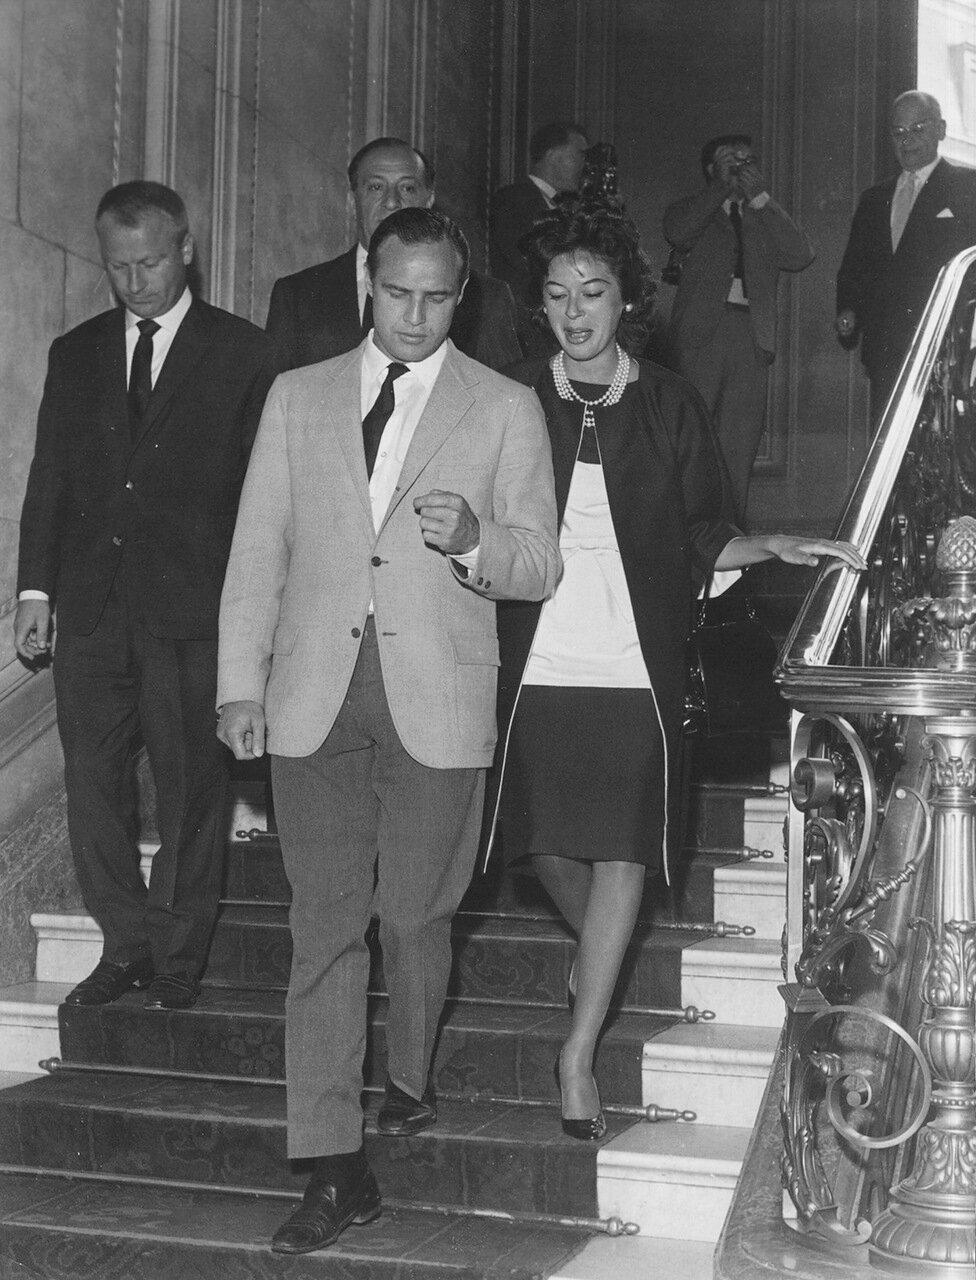 Marlon Brando Dead at 80